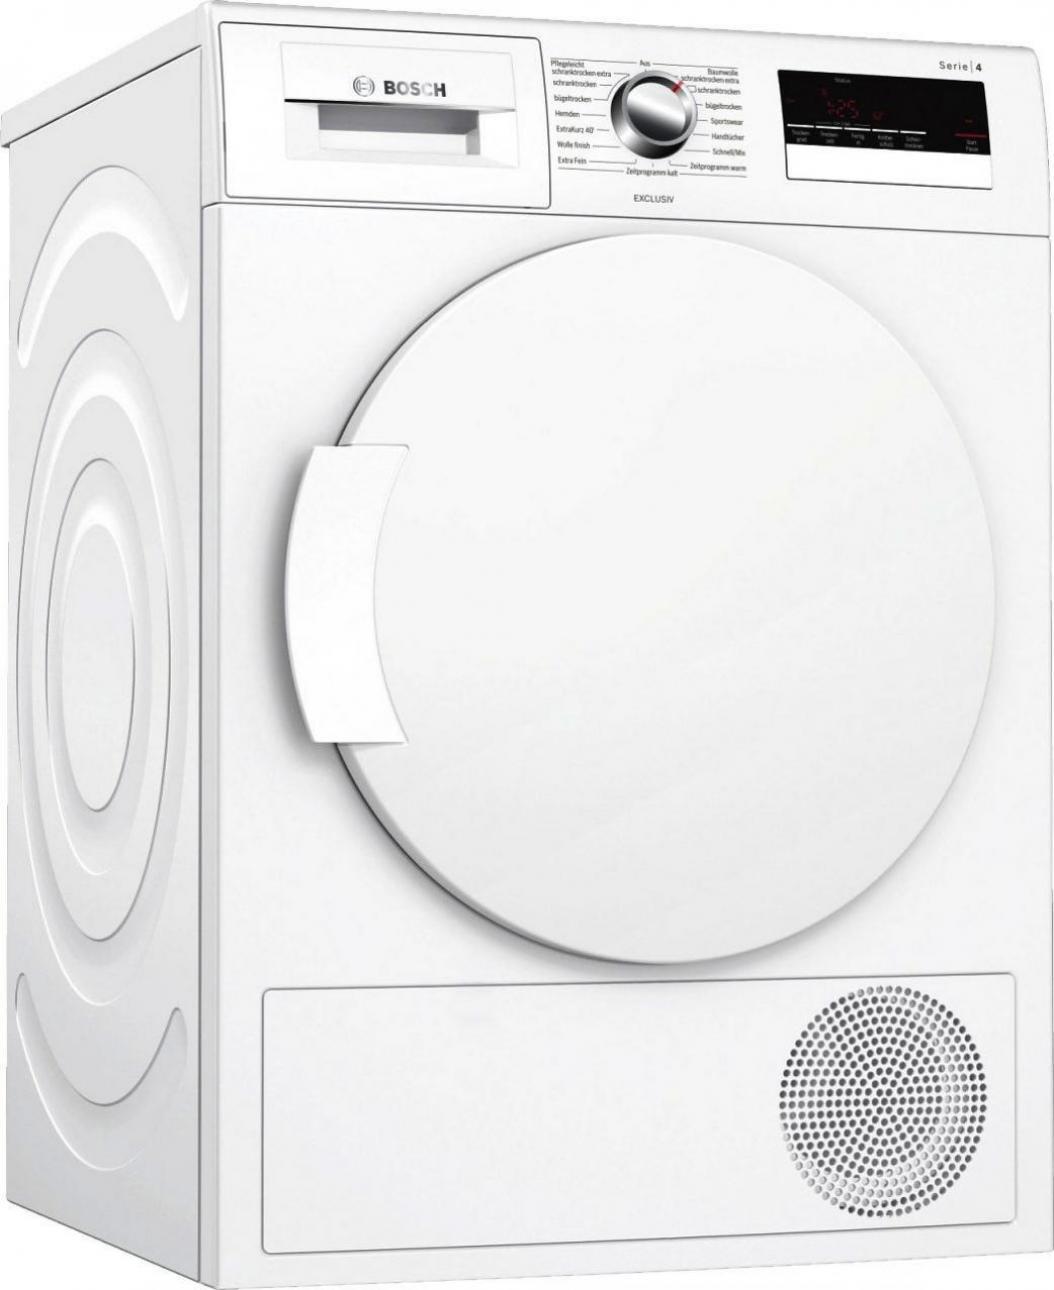 Bosch WTH832E27 Warmepumpentrockner